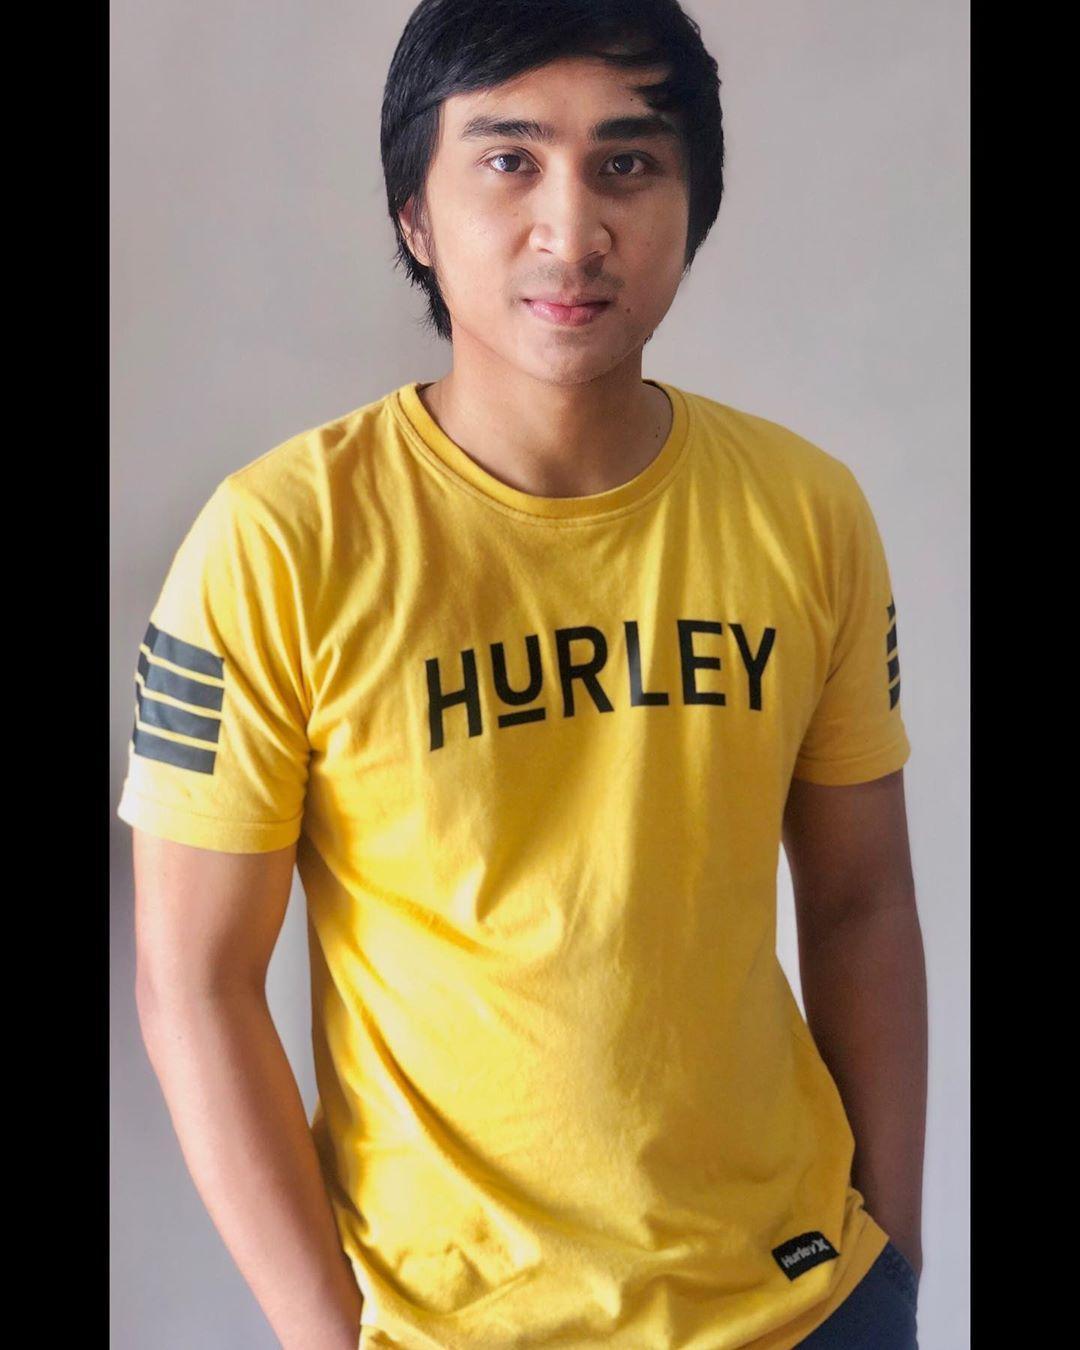 Kekasih anak Iis Dahlia itu menyatakan akan melelang baju kuning yang dianggapnya viral.